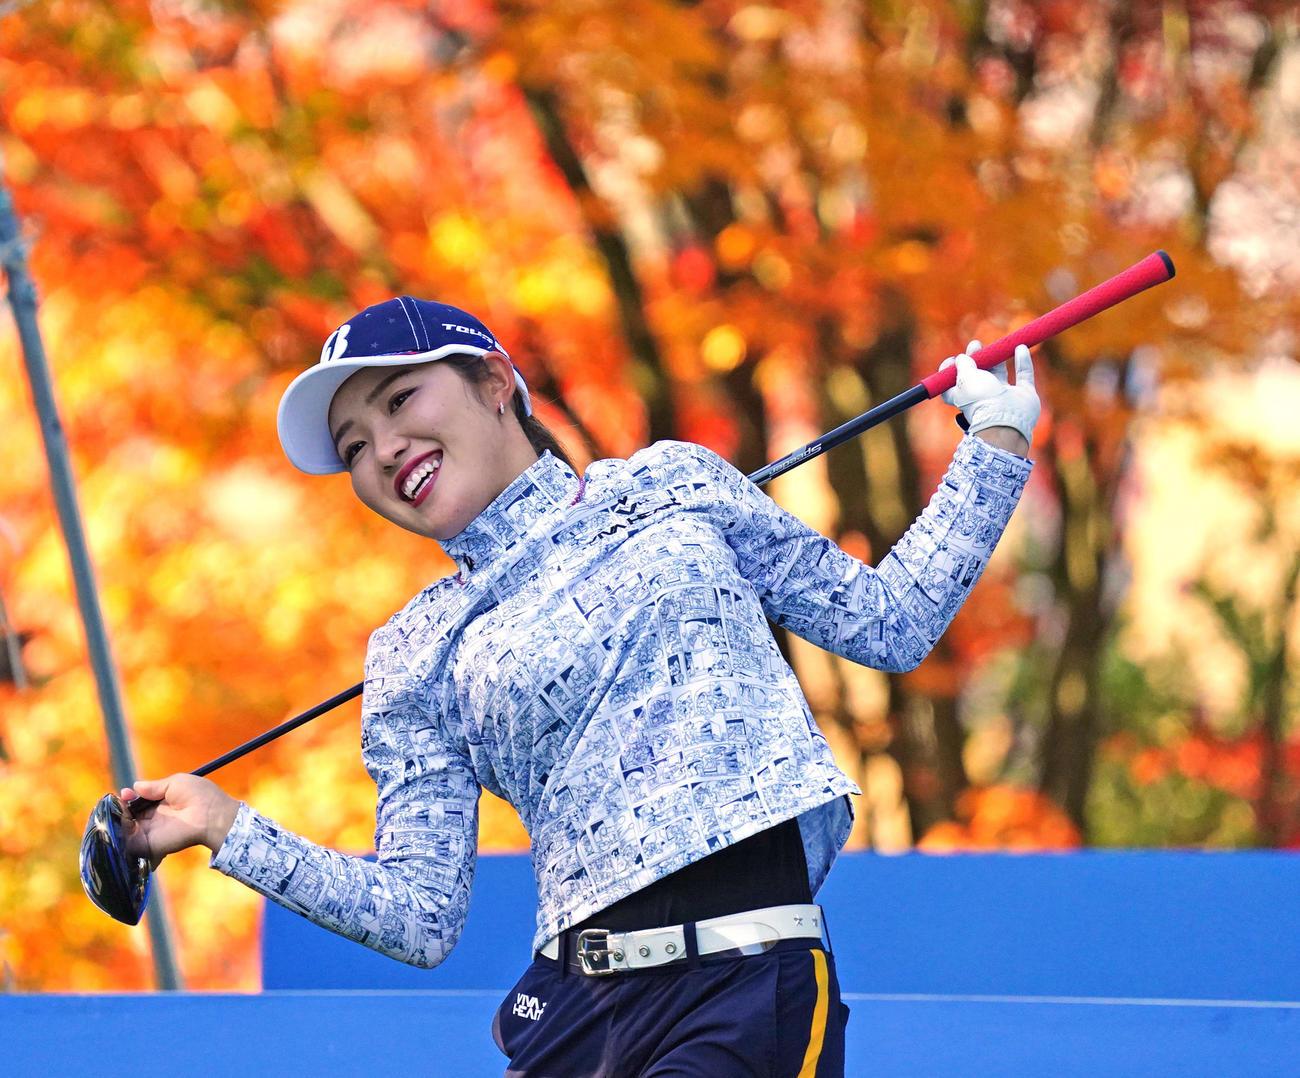 https://www.nikkansports.com/sports/golf/news/img/202011180000662-w1300_0.jpg